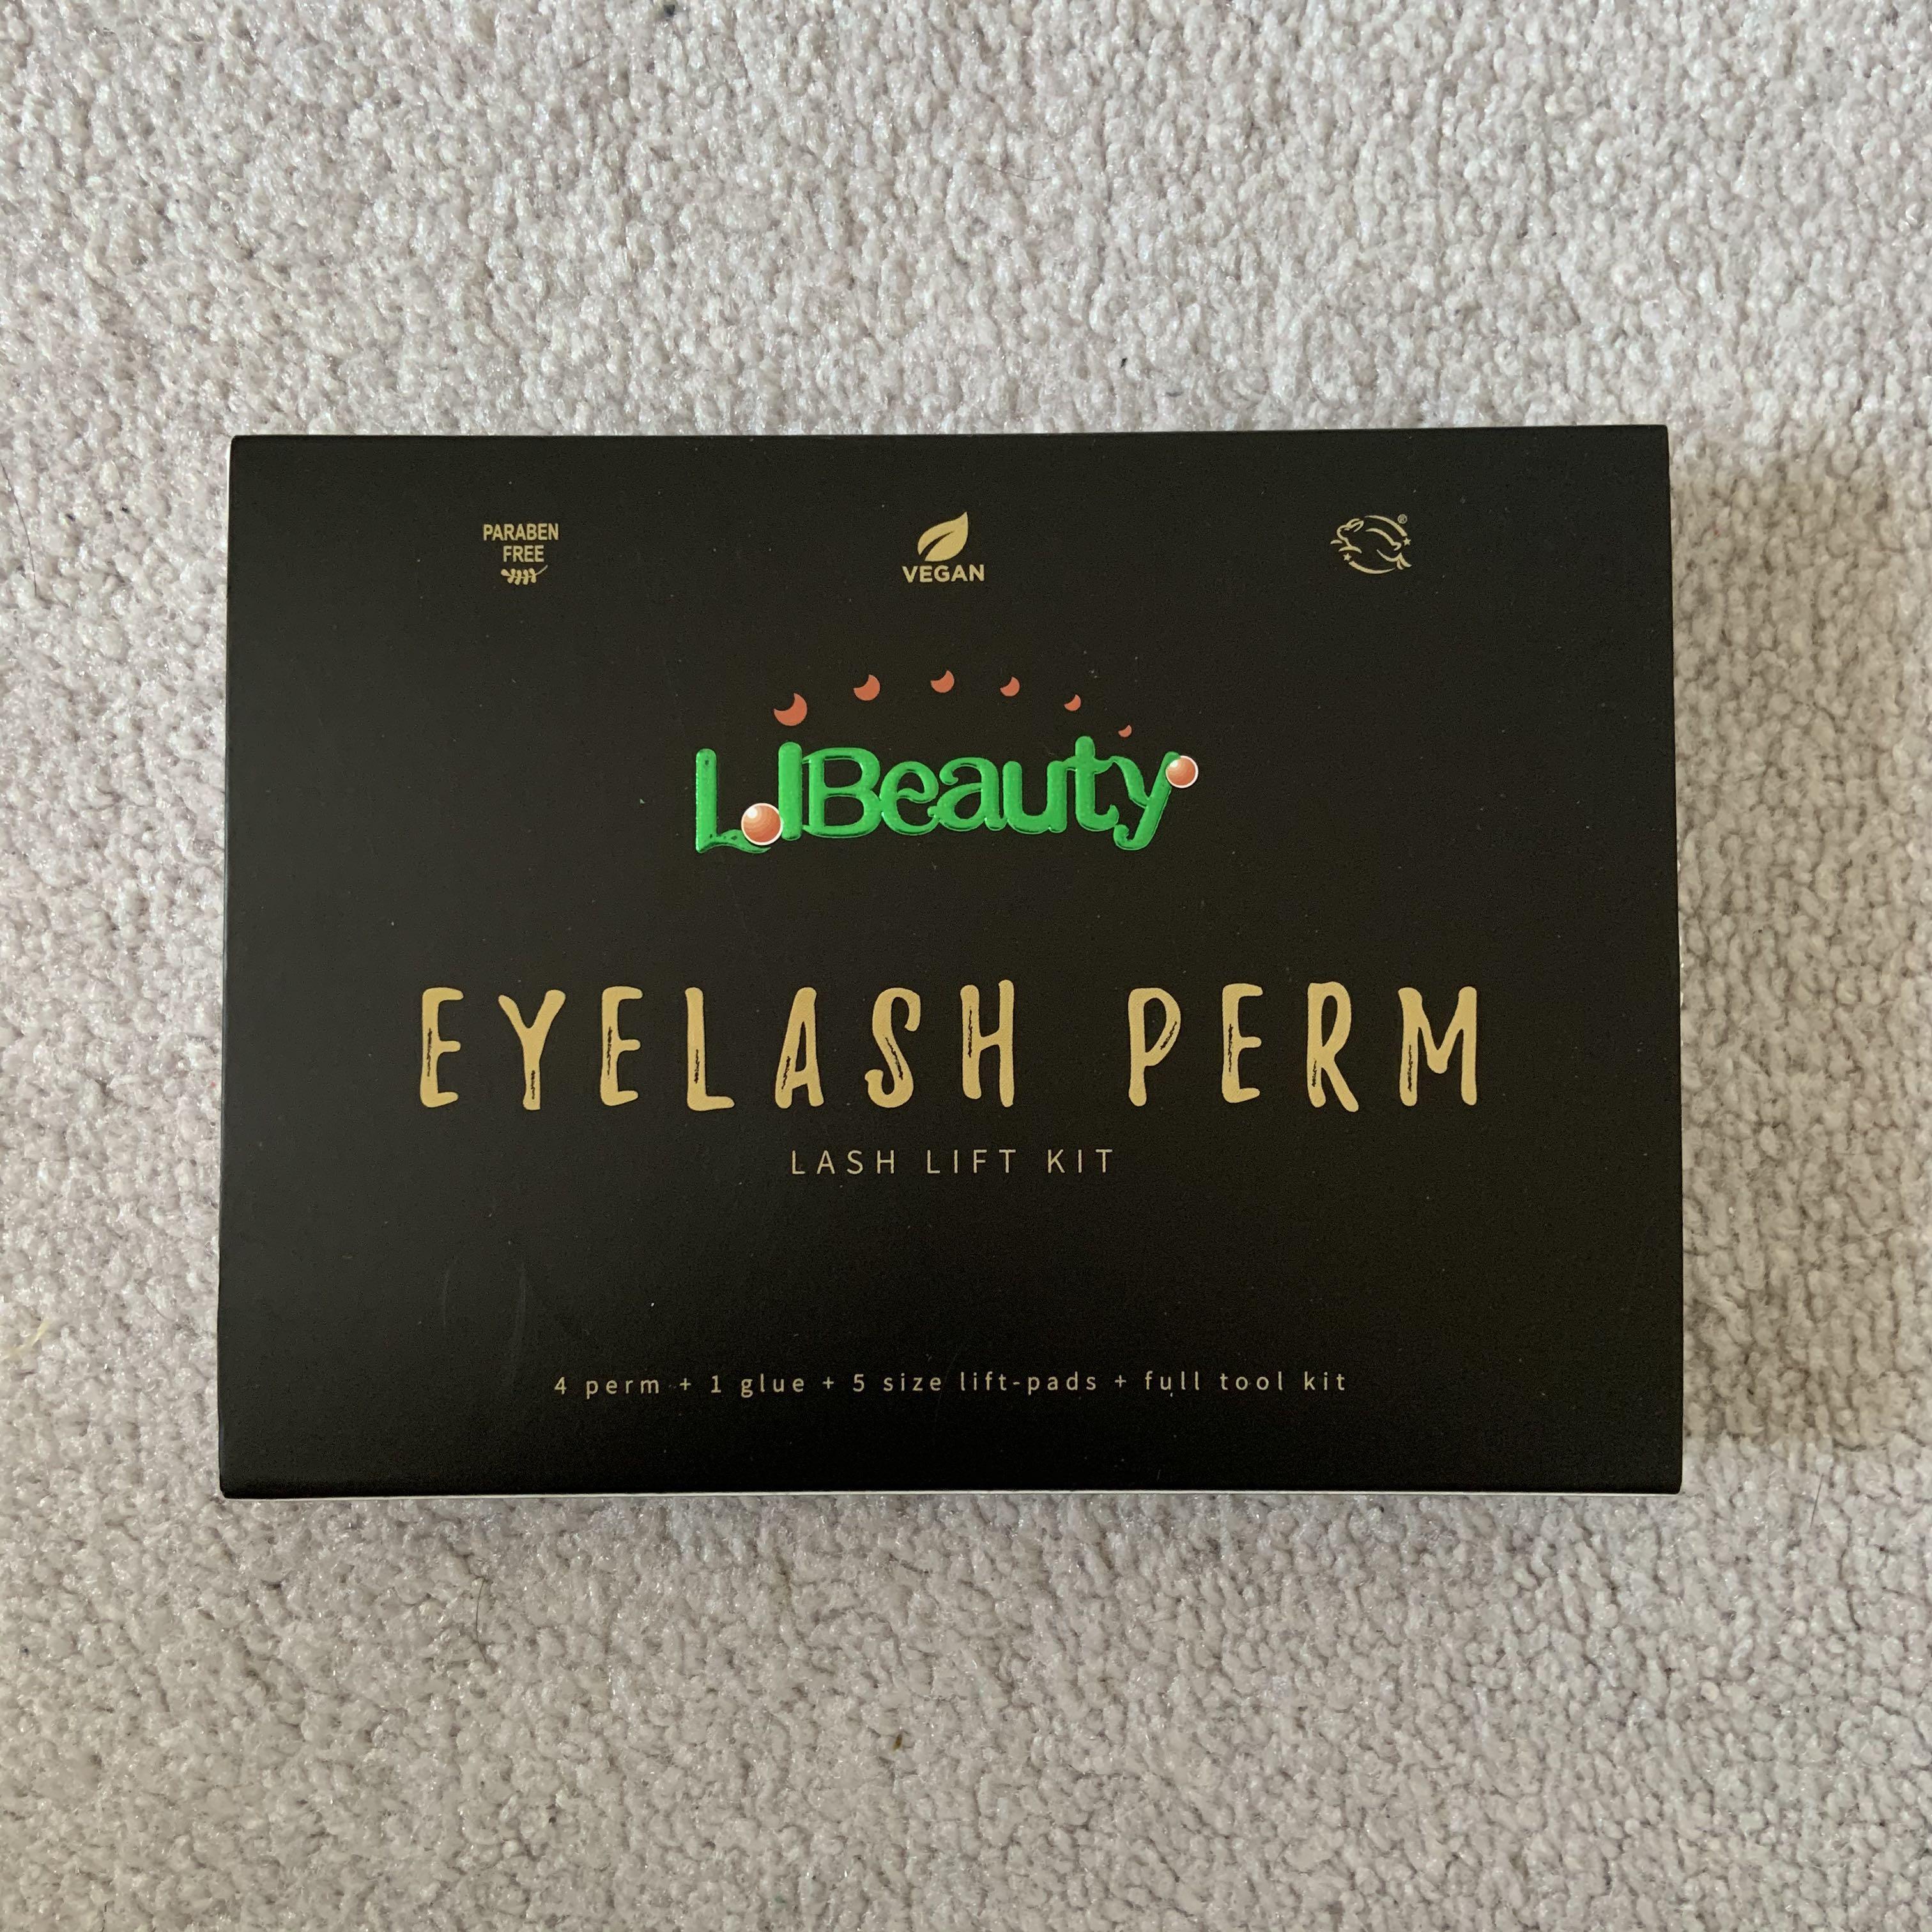 Libeauty Lash Lift Kit